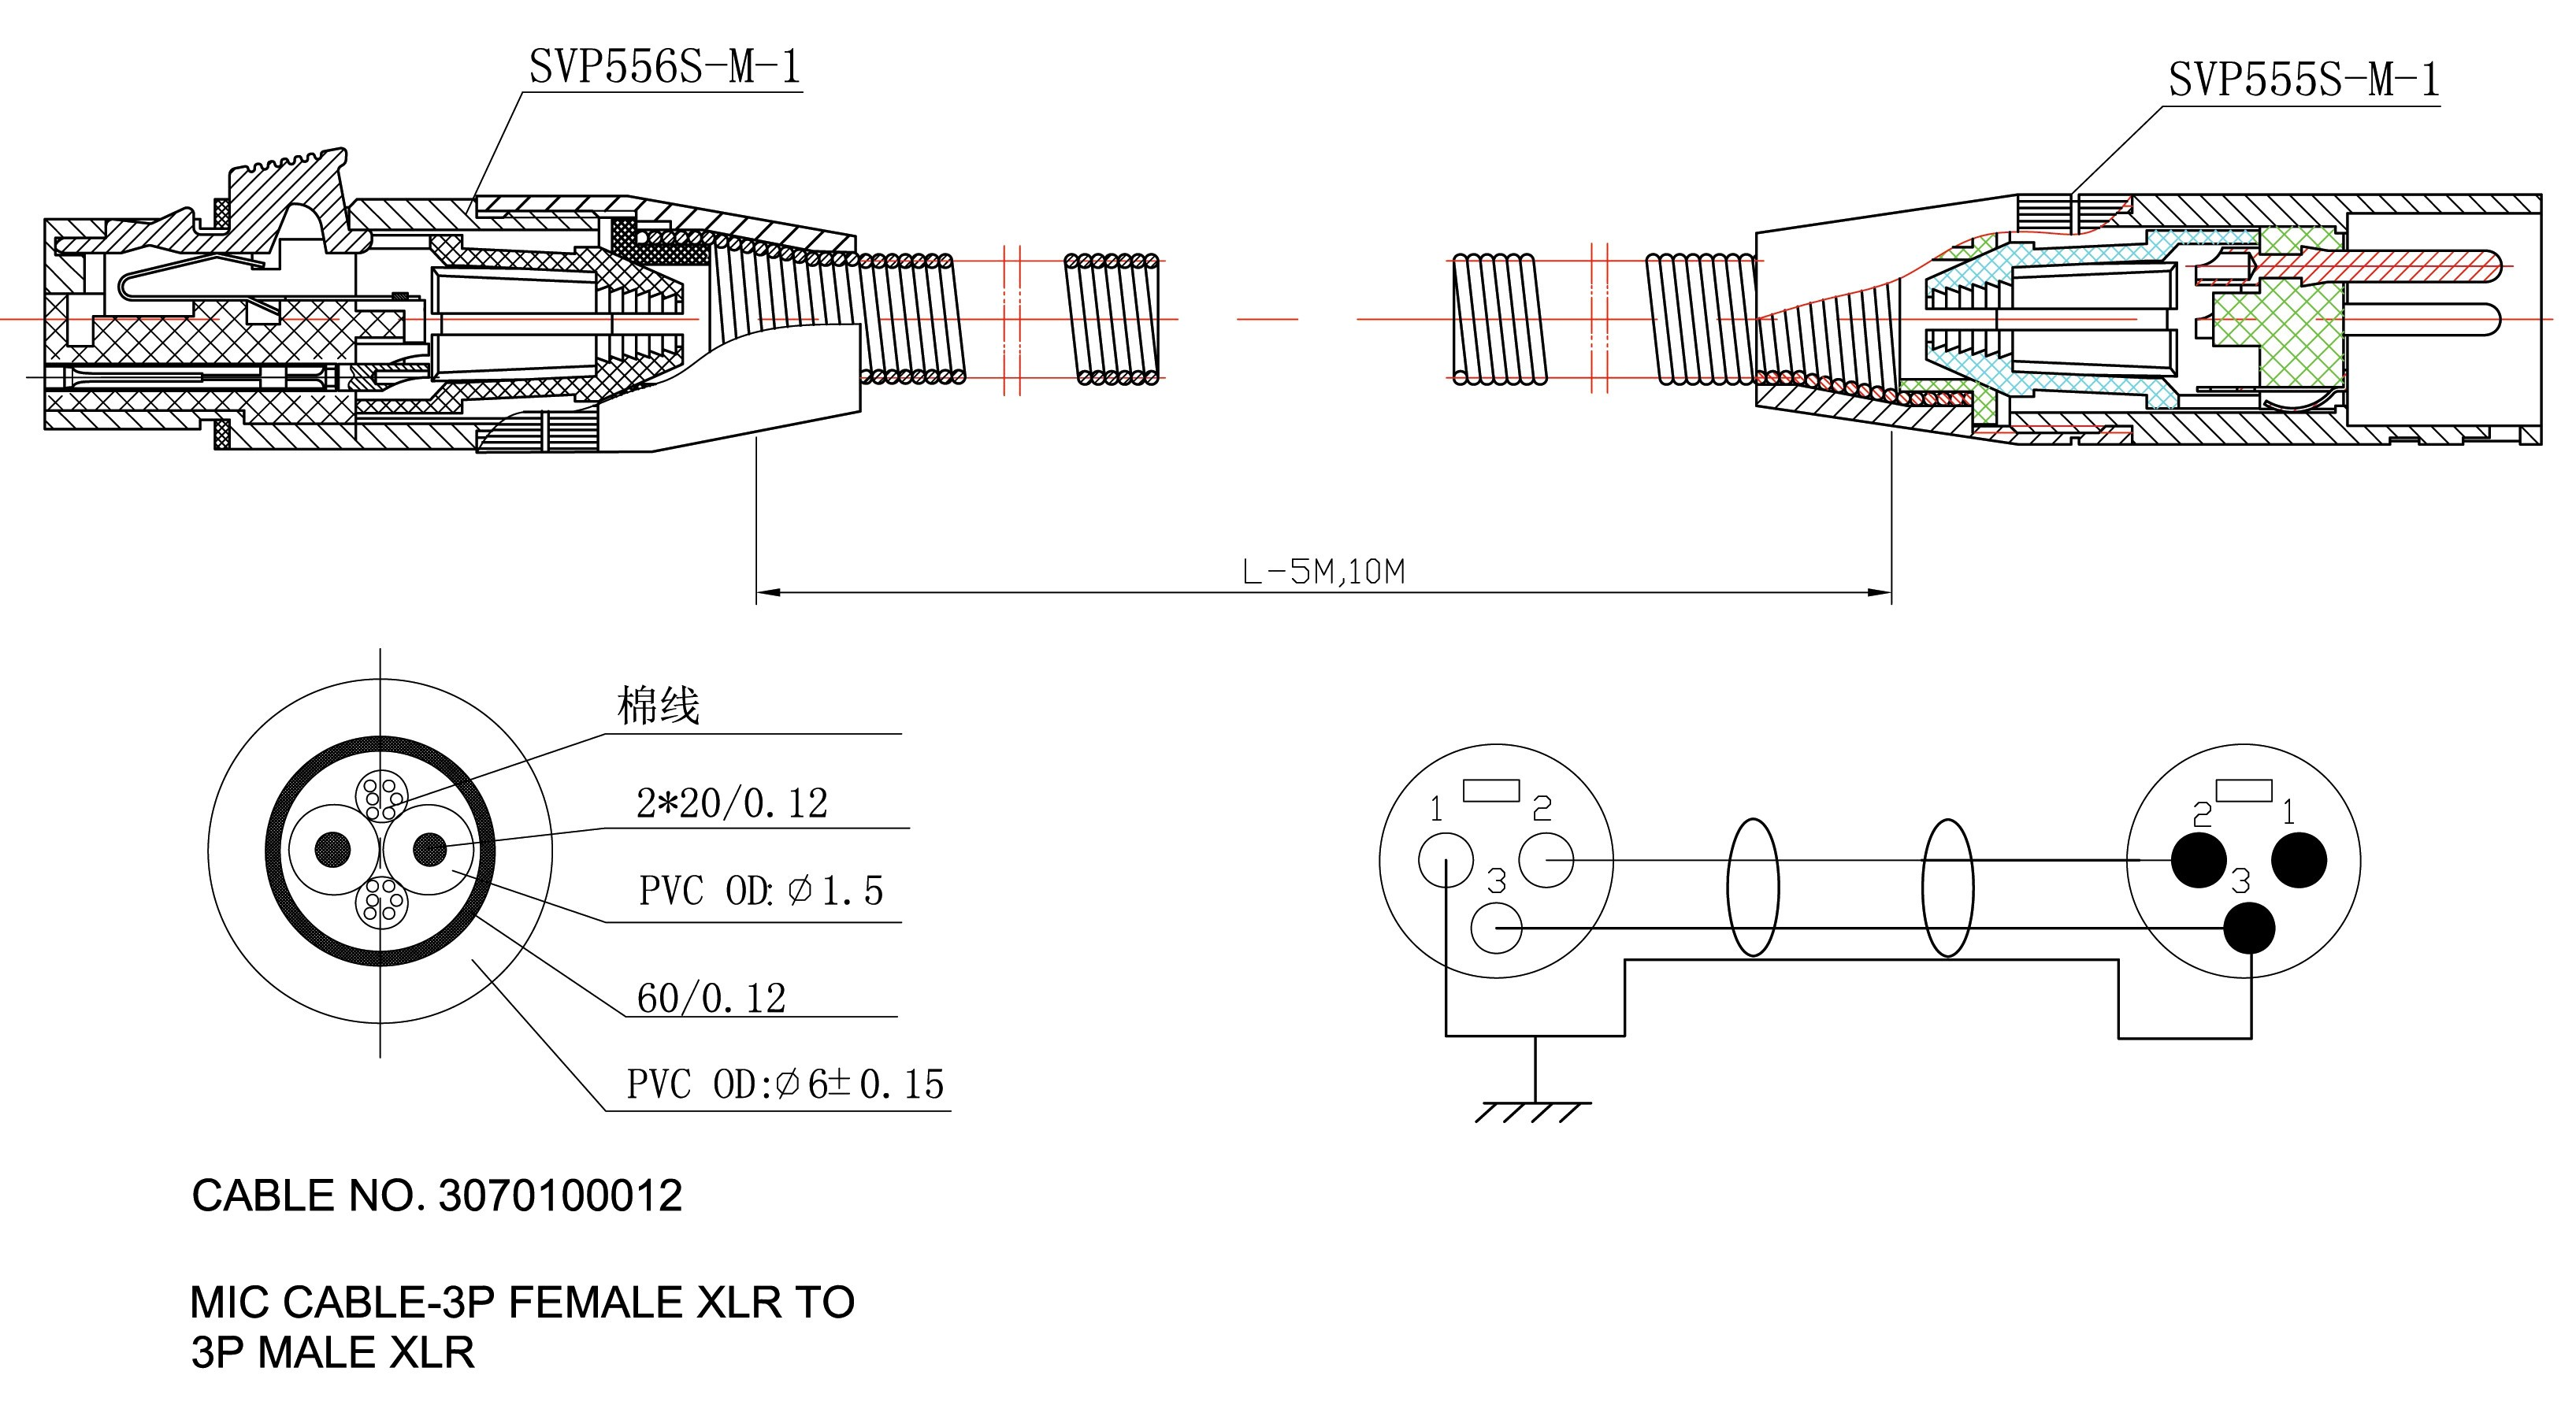 Find Comprehensive Diagram Of Car Parts Electric Motor Parts Diagram sources Of Find Comprehensive Diagram Of Car Parts